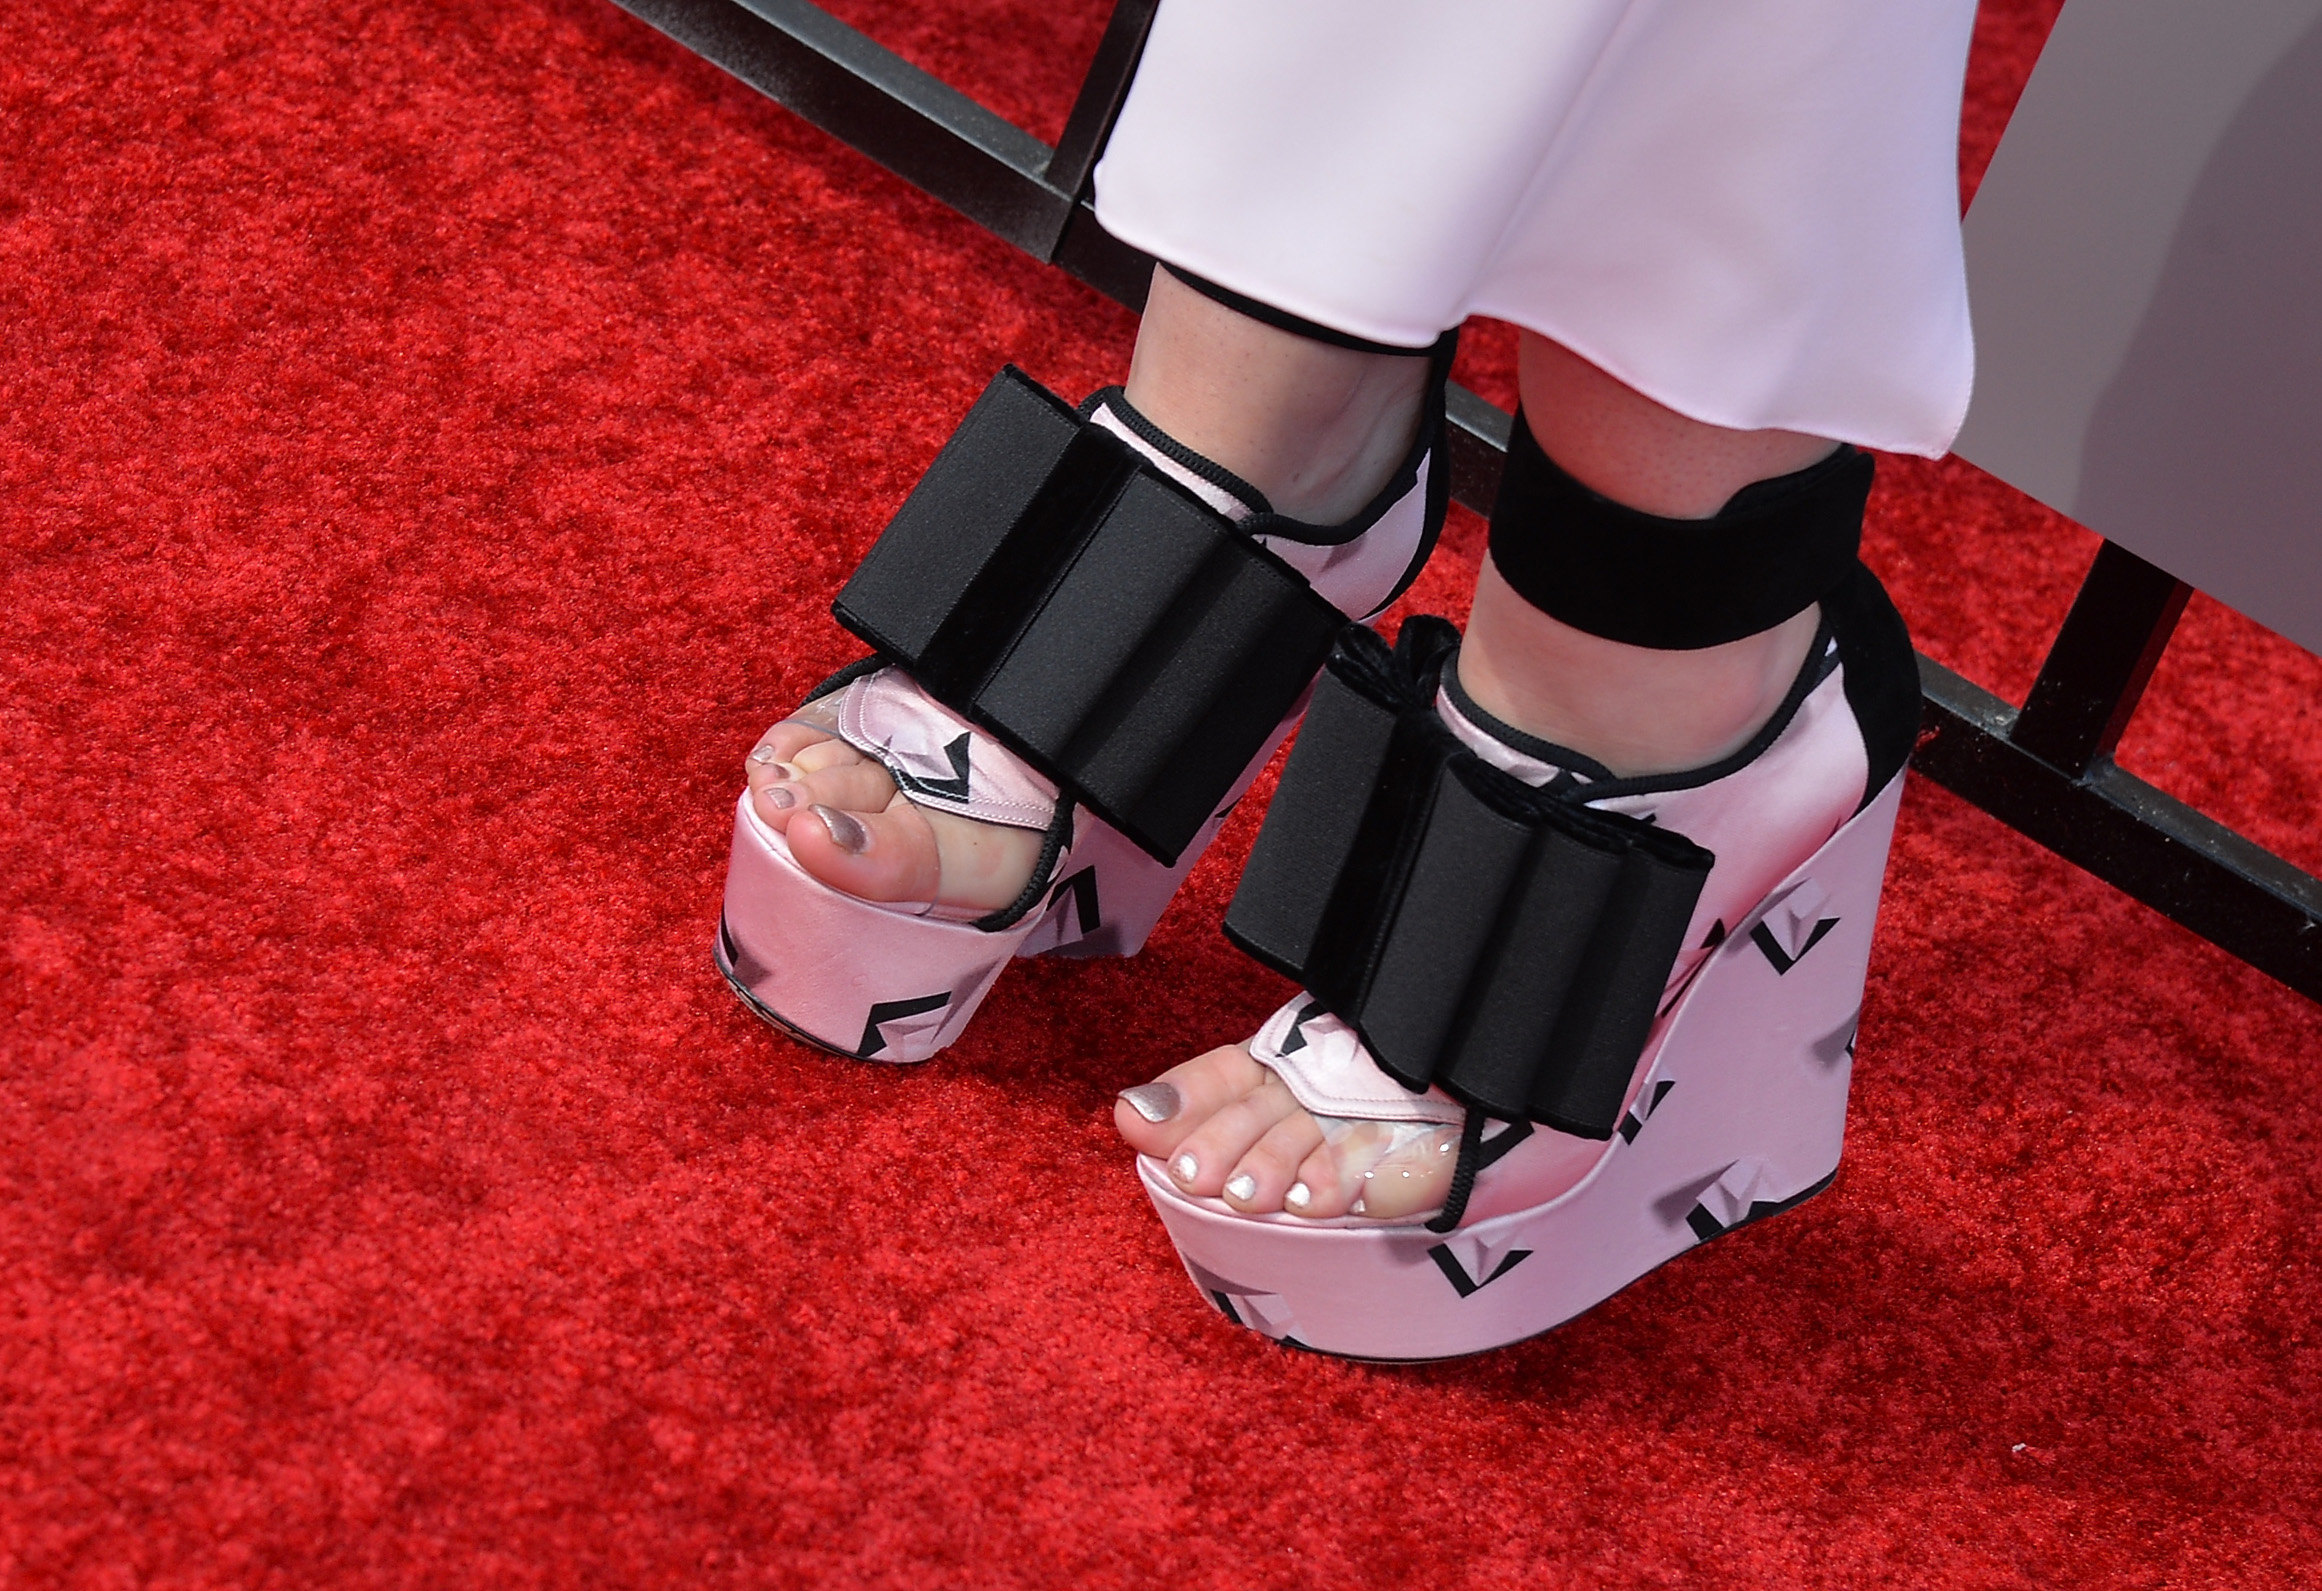 Iggy azalea toes